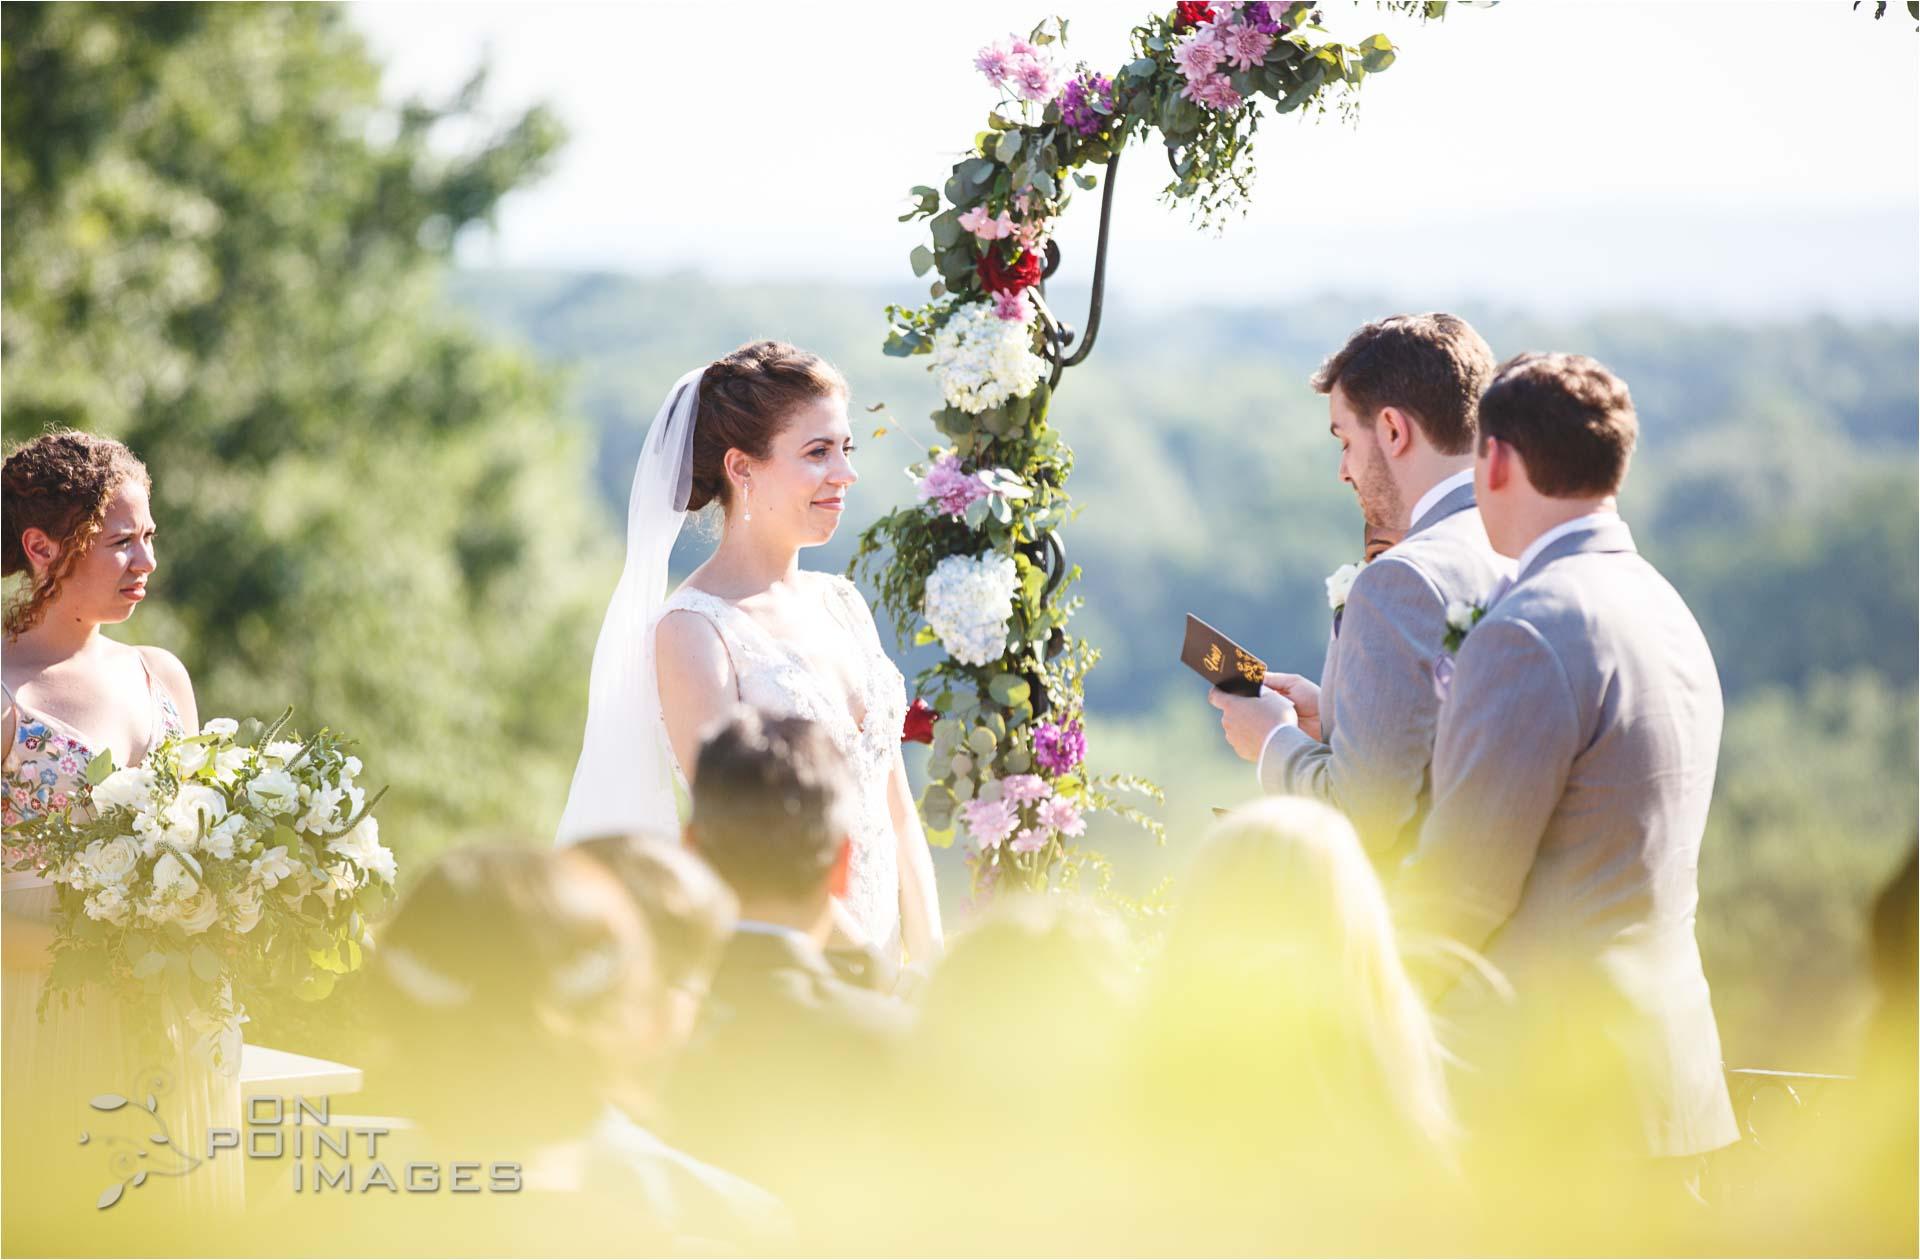 wickham-park-wedding-photographer-ct-21.jpg